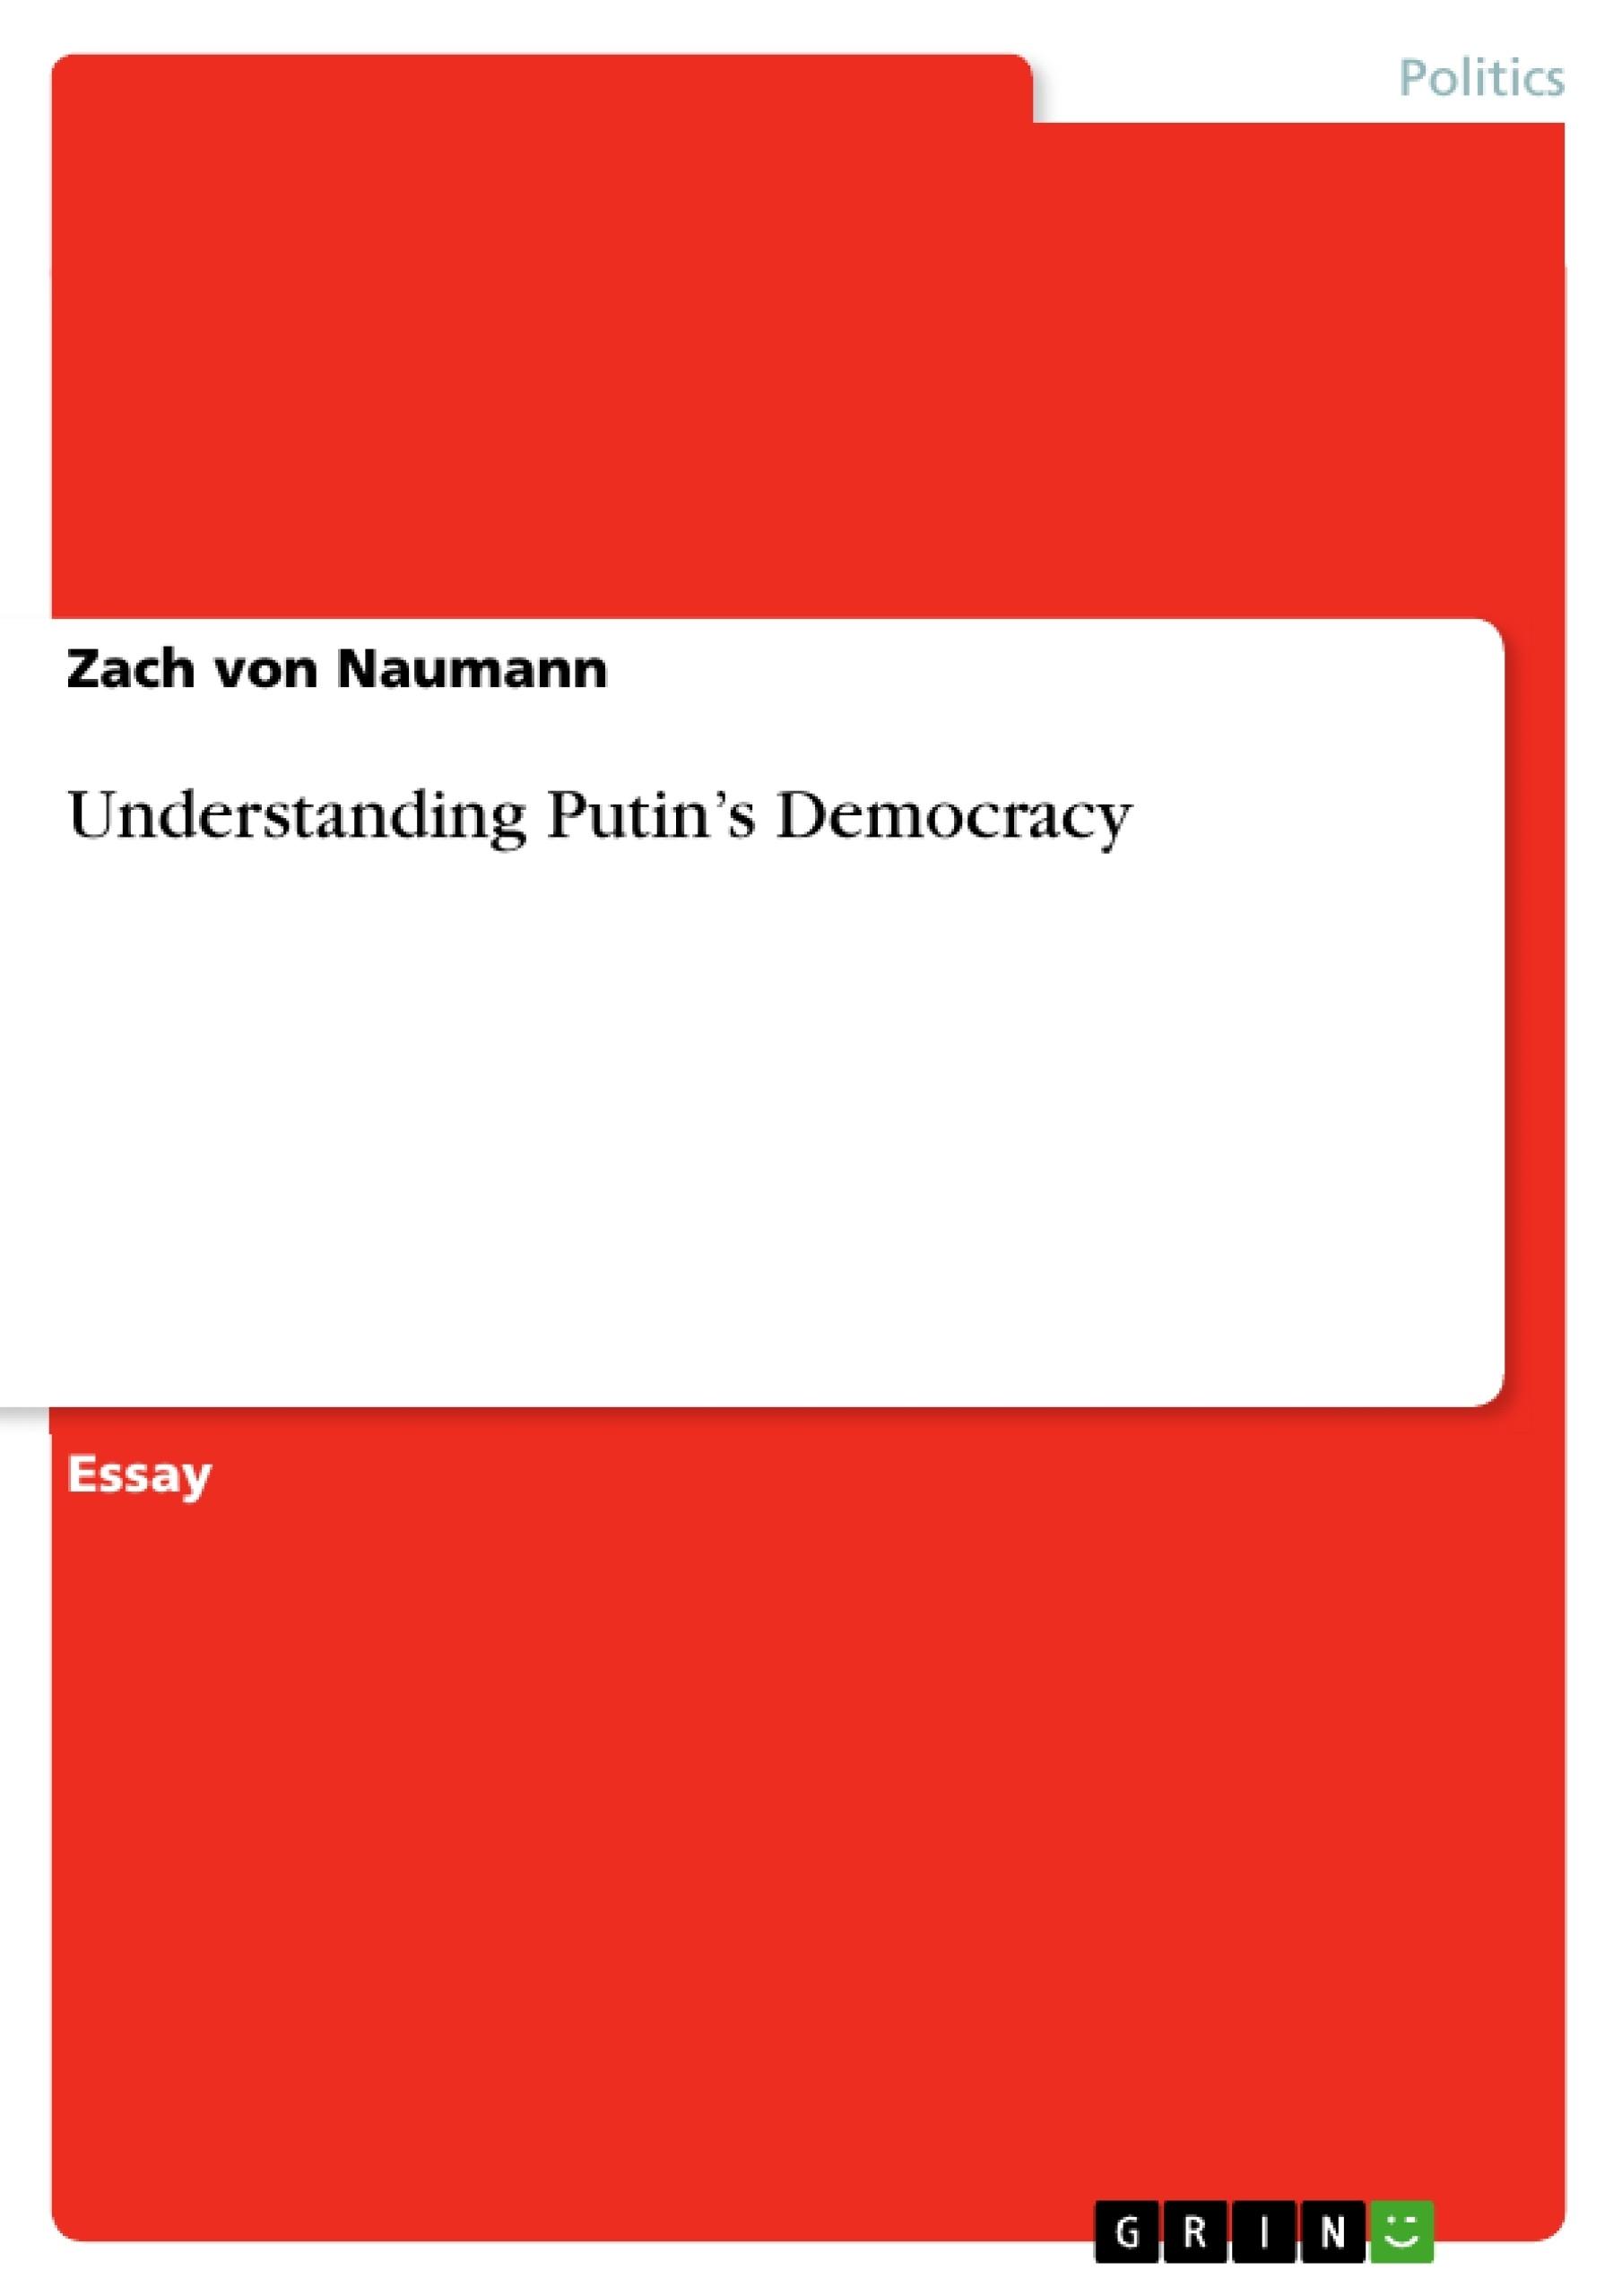 Title: Understanding Putin's Democracy